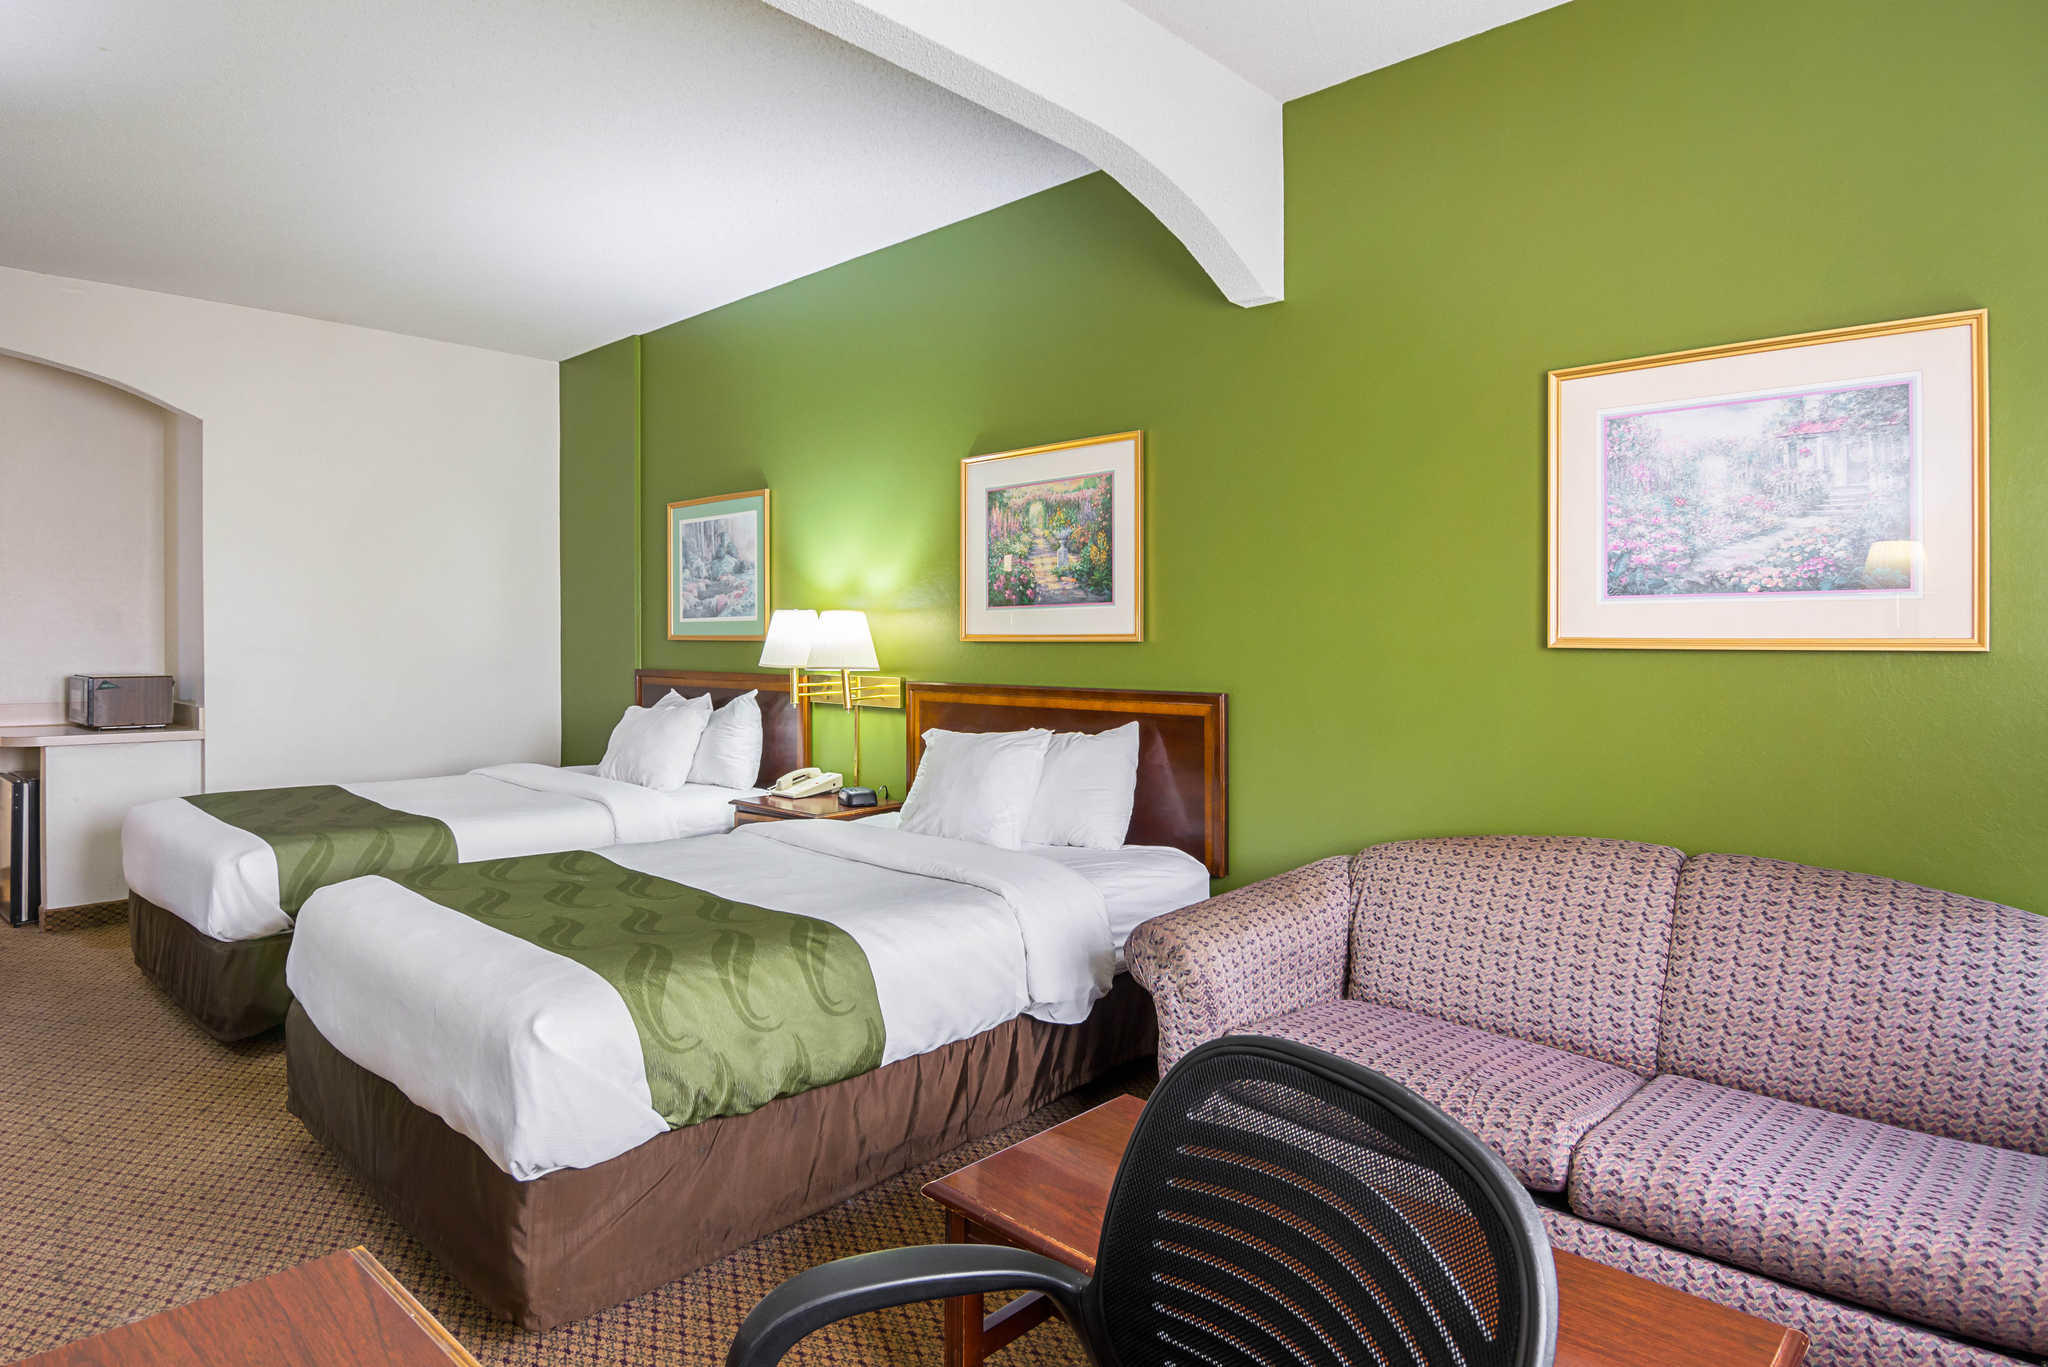 Quality Inn & Suites Kearneysville - Martinsburg image 9